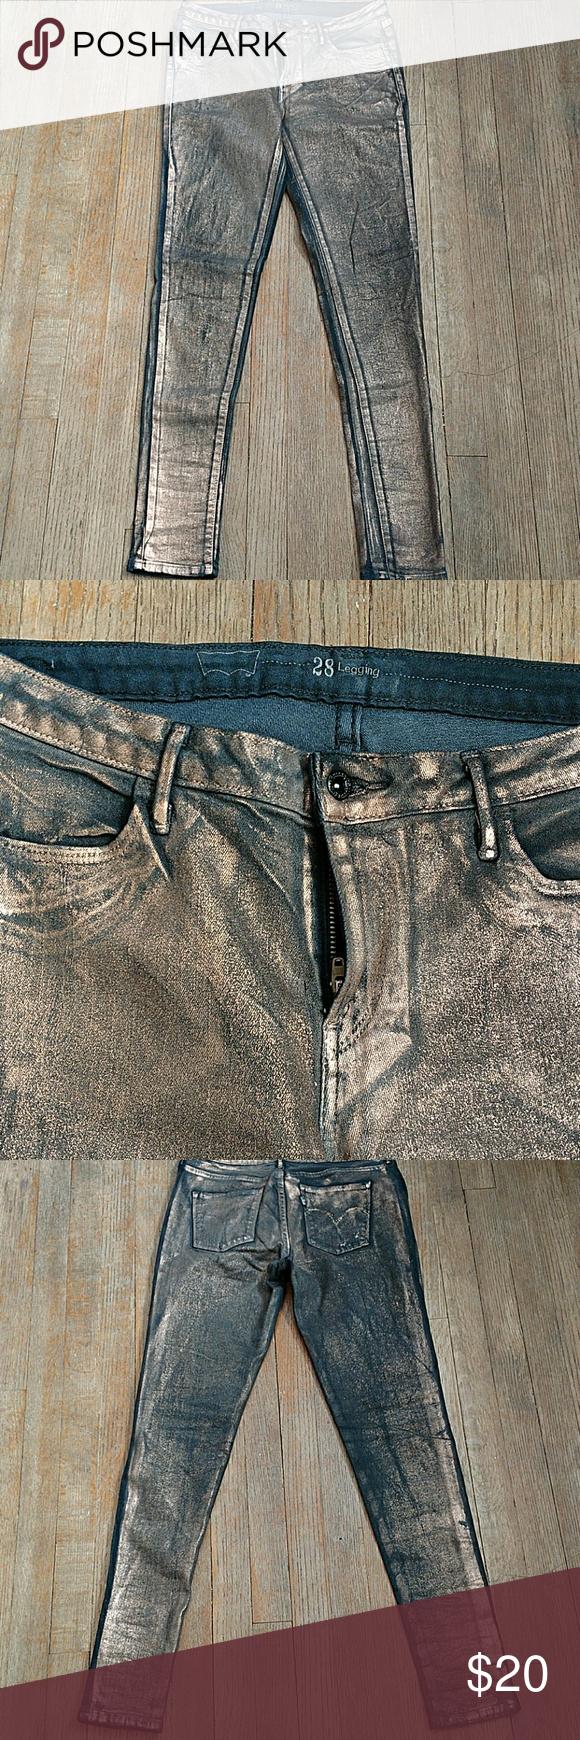 Levis Copper Coated Metallic Leggings Excellent condition Levi's Jeans Skinny